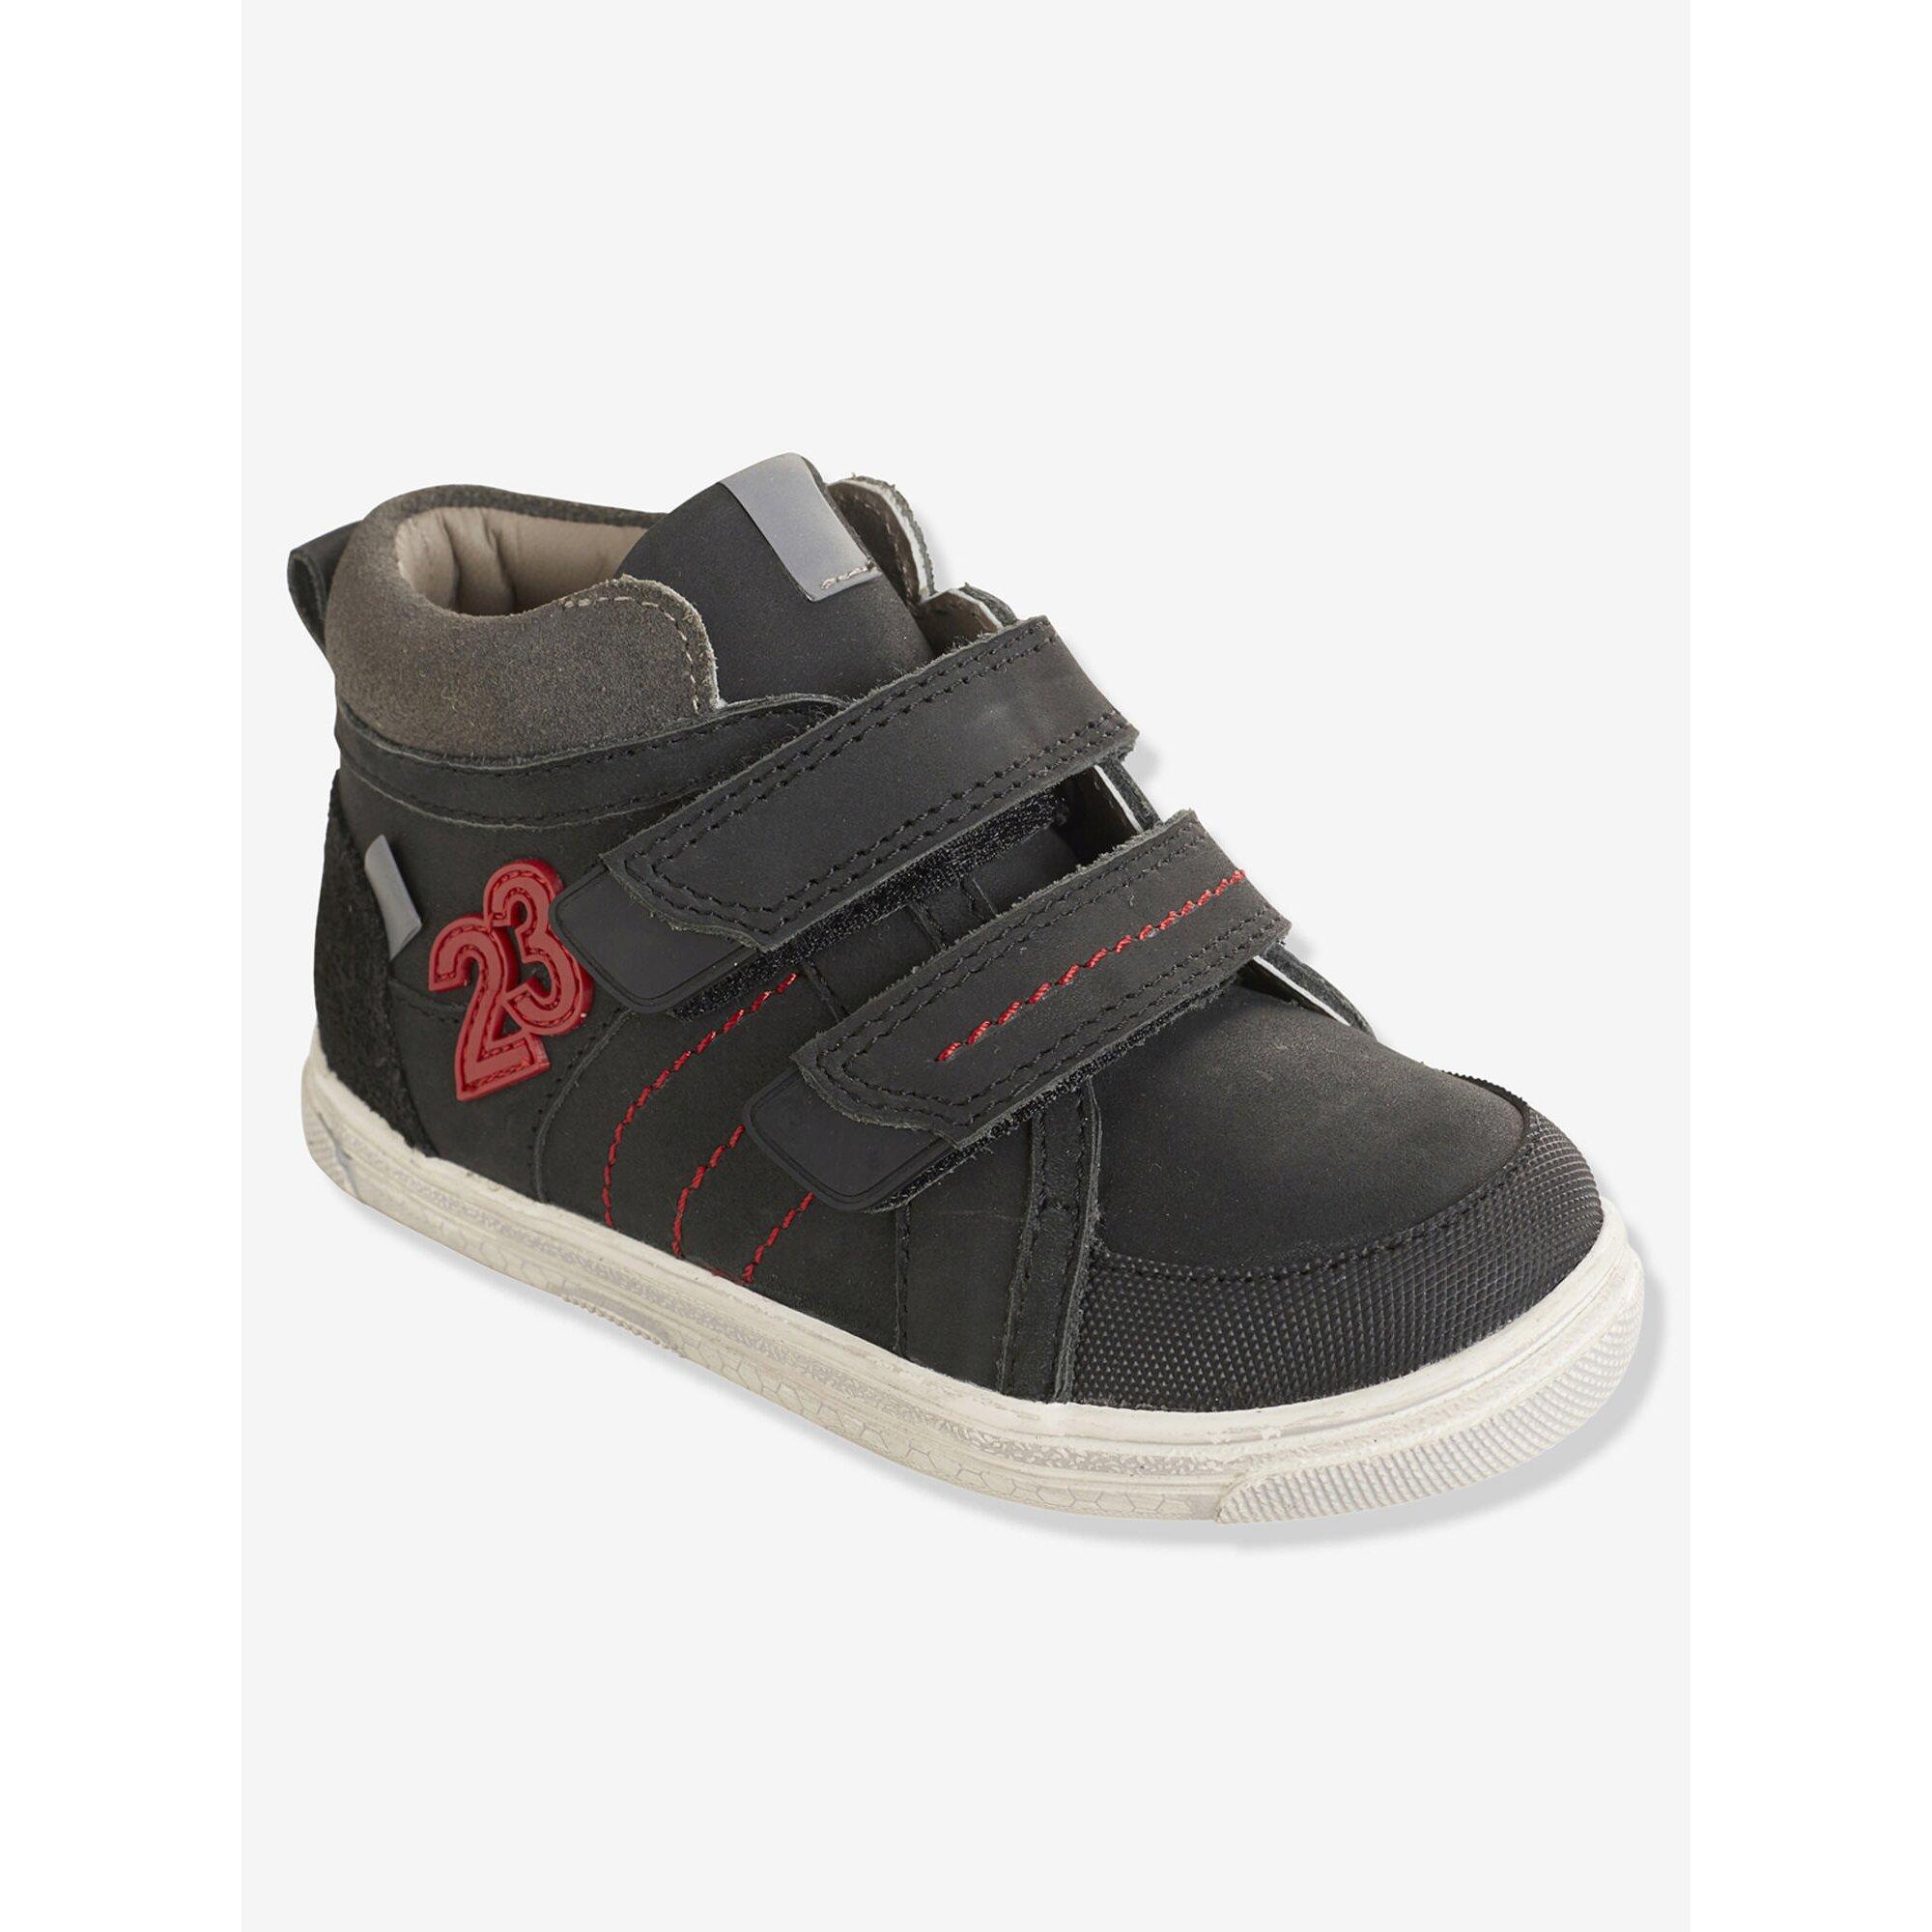 vertbaudet-leder-sneakers-fur-jungen-anziehtrick, 50.99 EUR @ babywalz-de